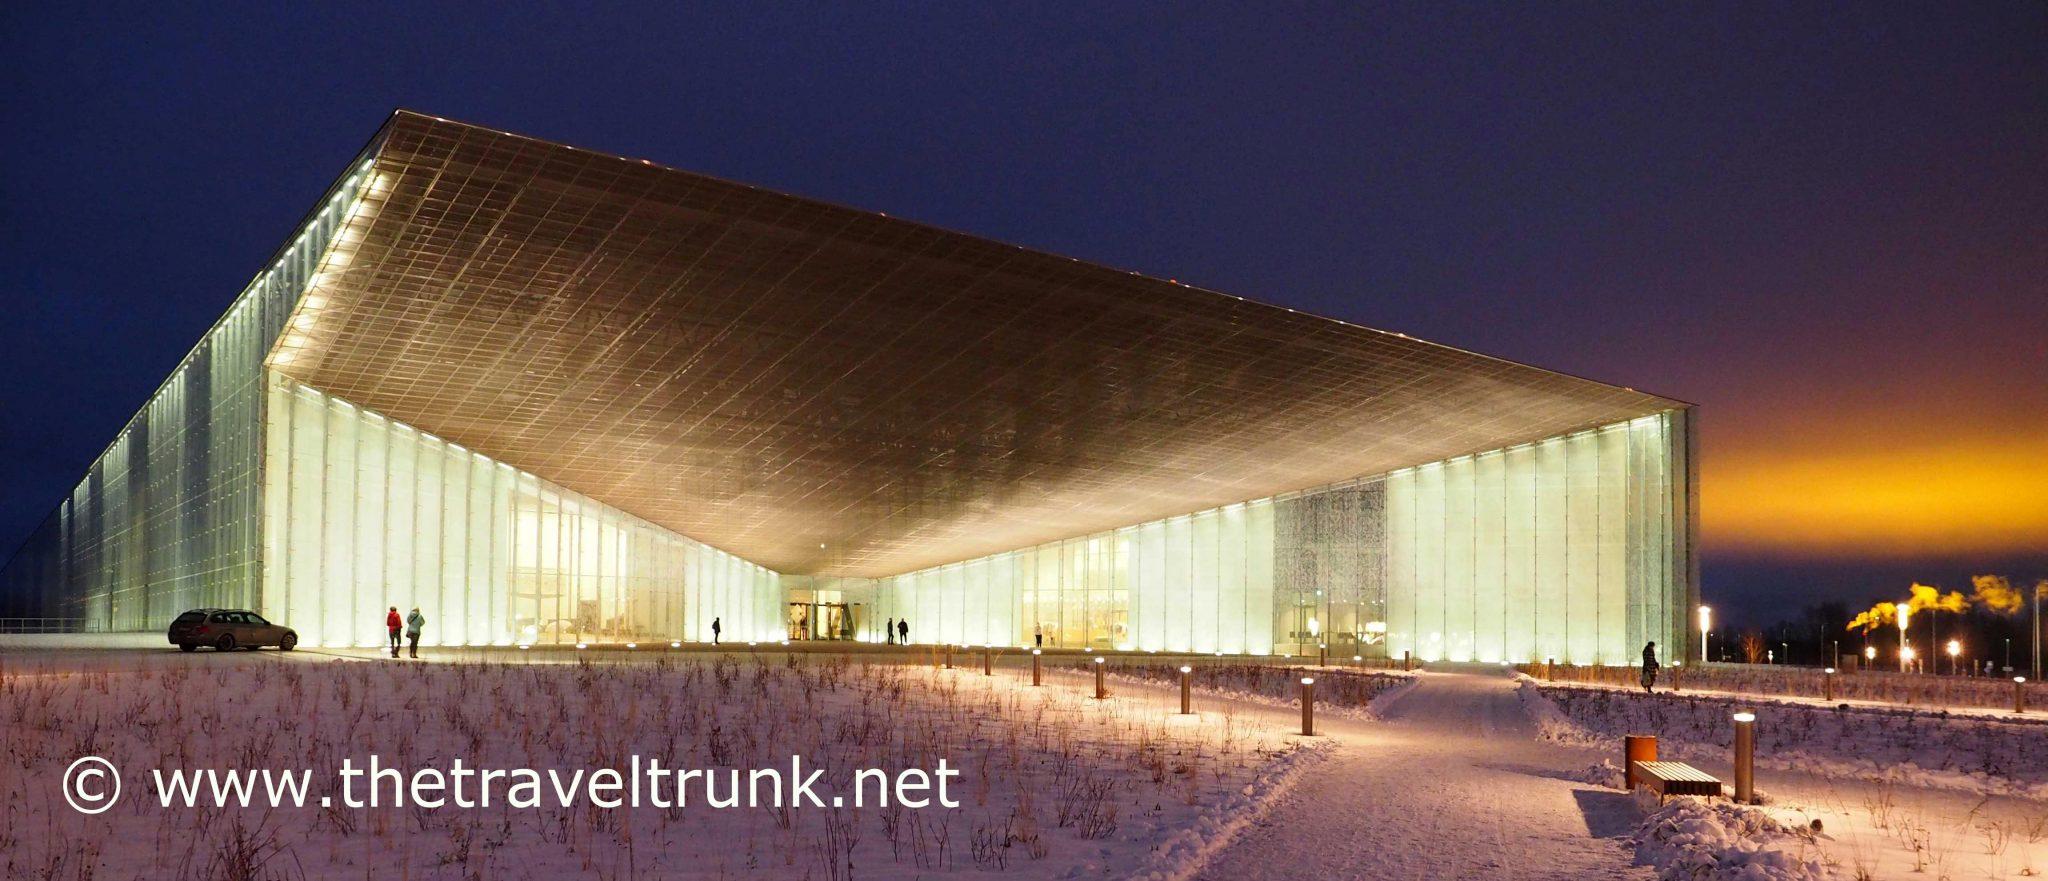 LIGHT SHINES ON NEW ESTONIAN MUSEUM